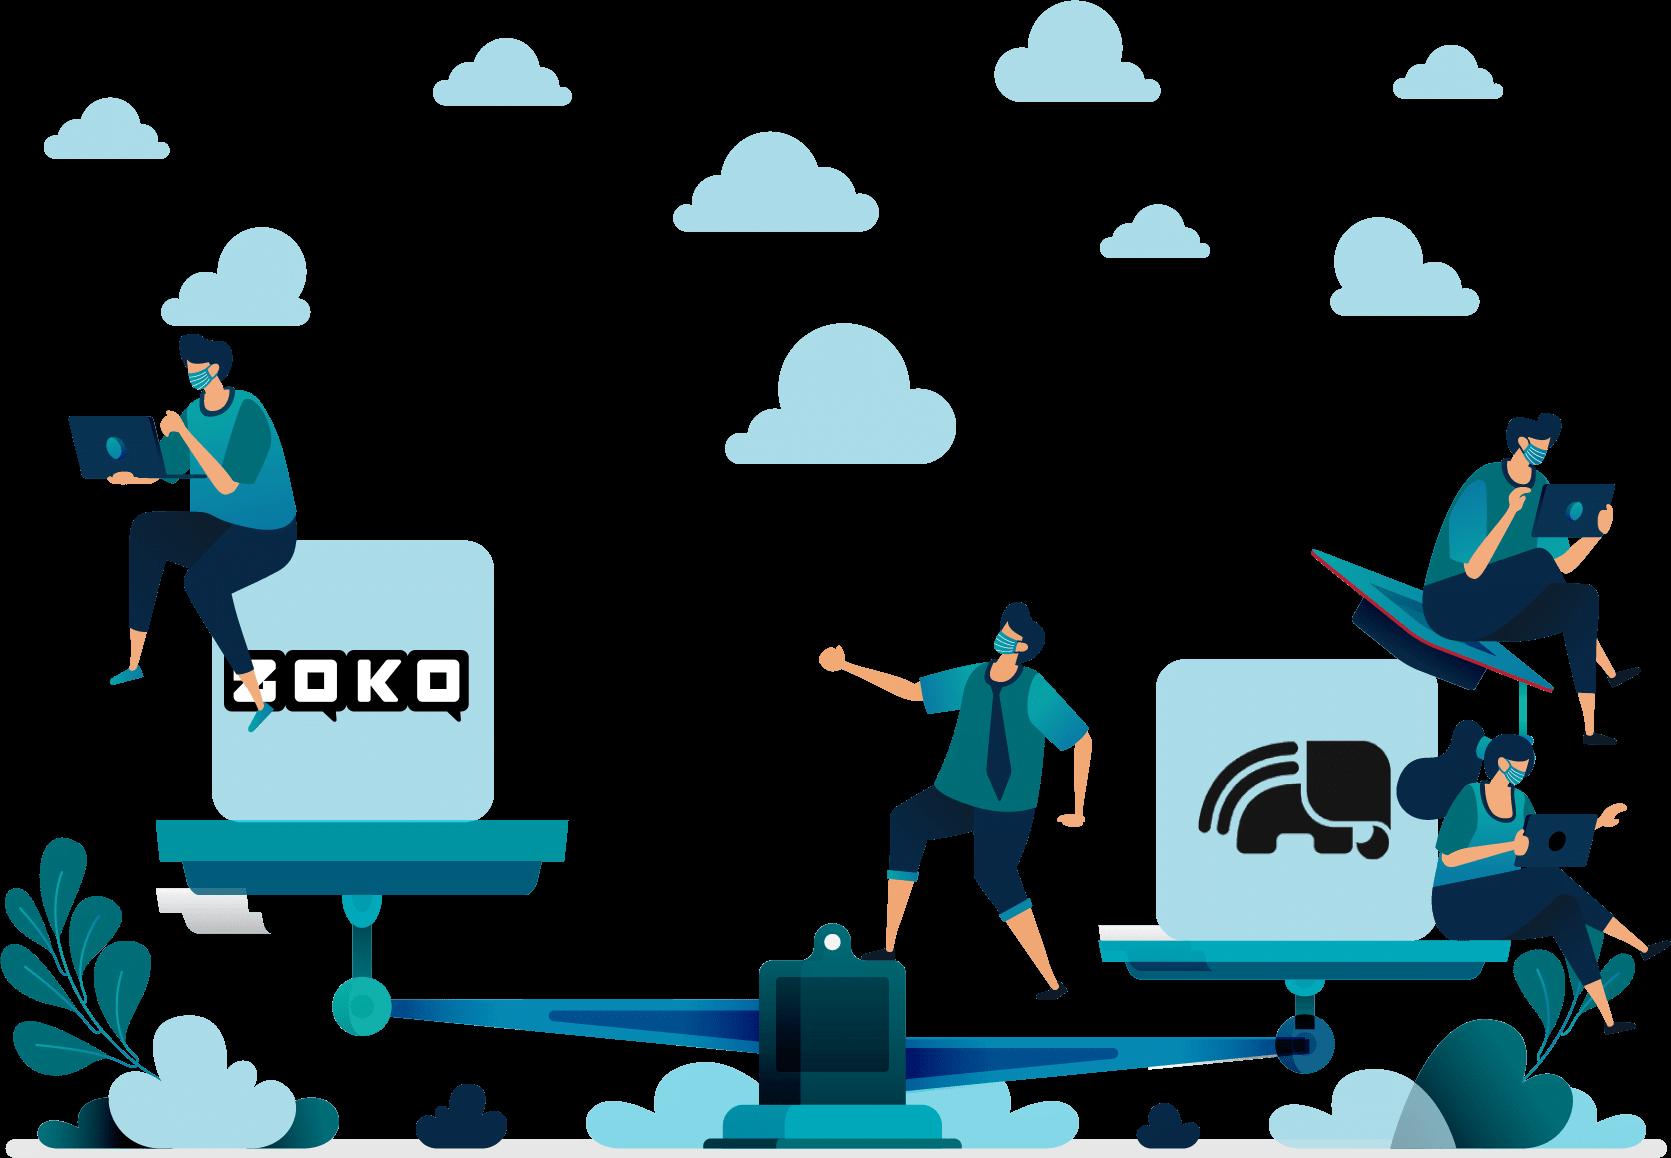 Tellephant vs Zoko